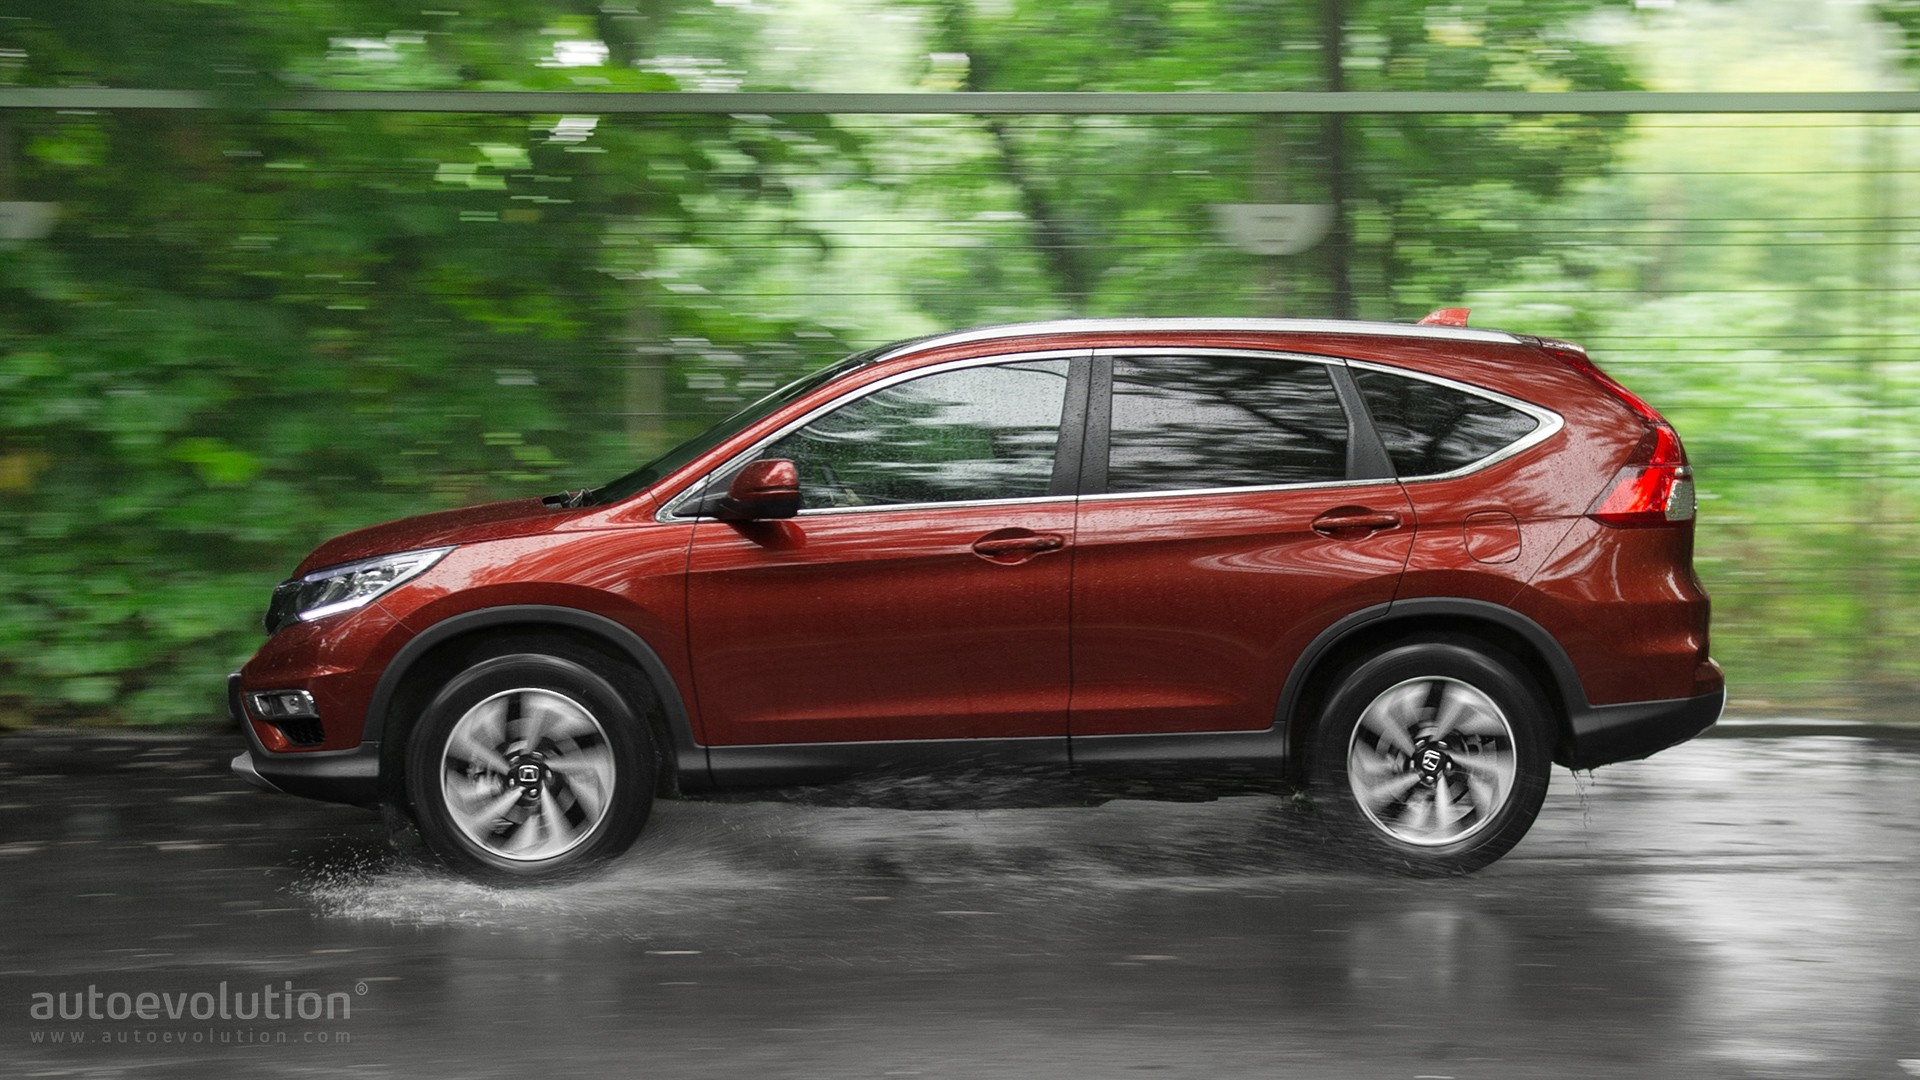 Image Result For Honda Crv Colors